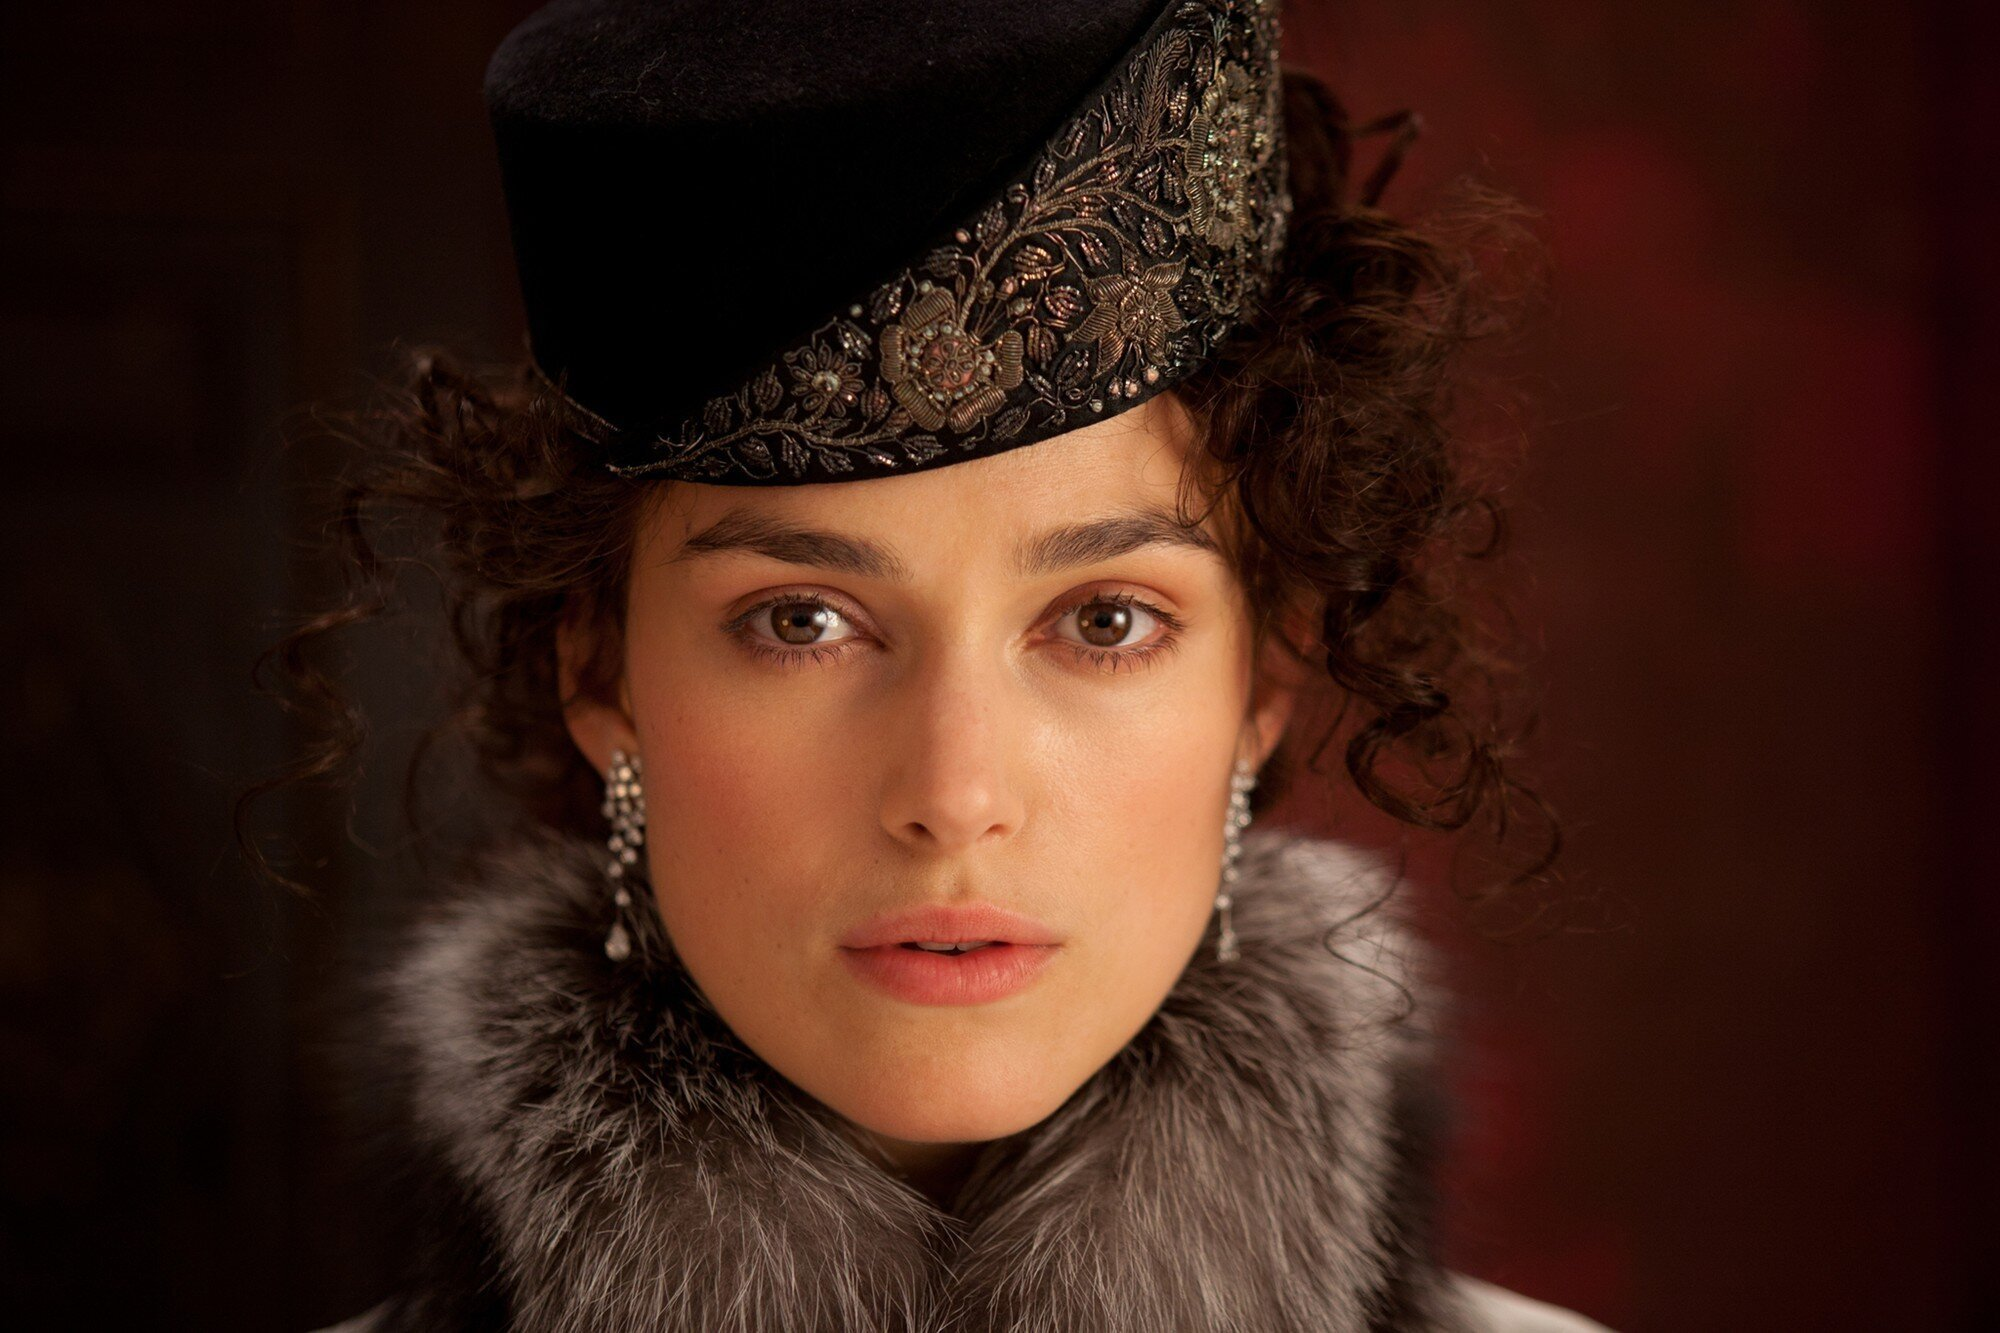 Keira Knightley's Facial Expressions Ruin Anna Karenina!